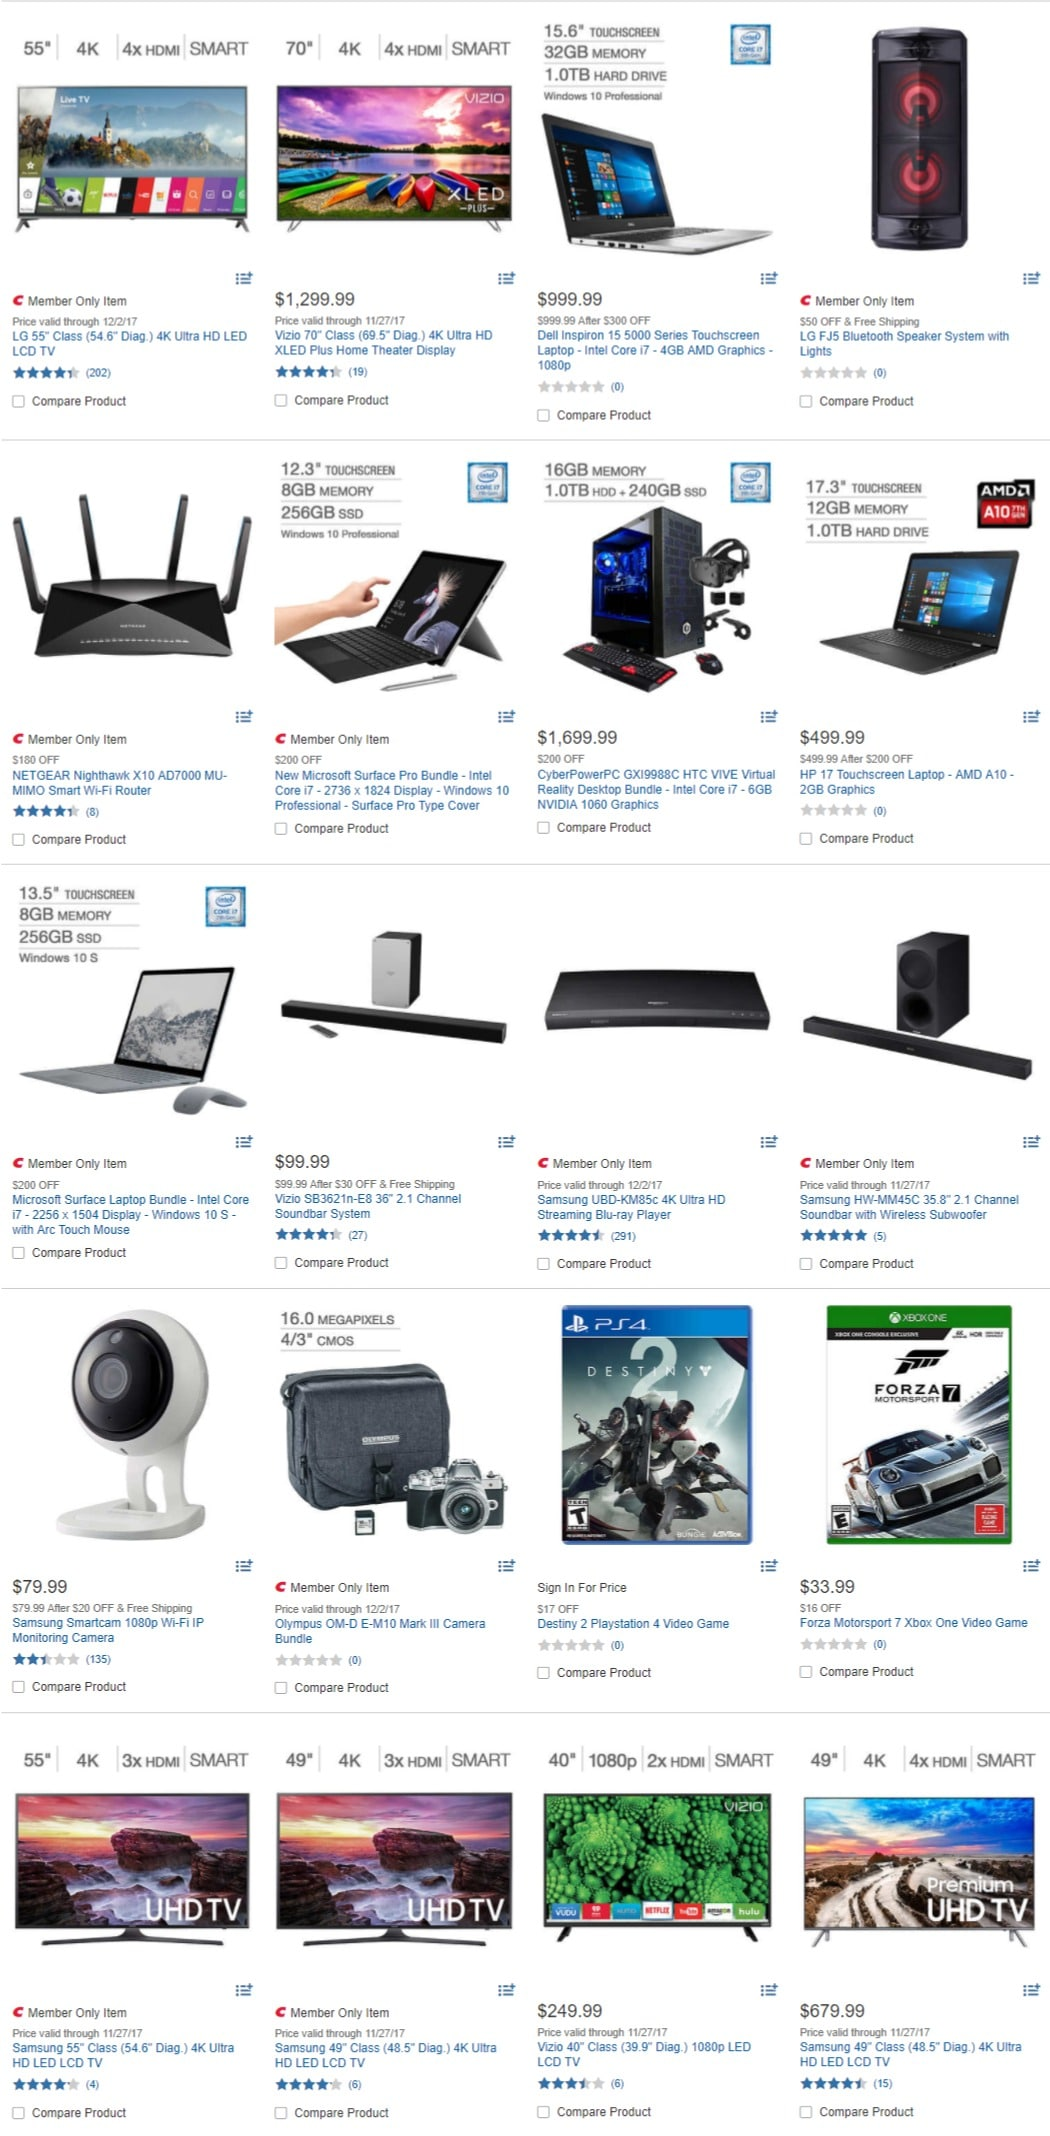 Costco Cyber Monday Deals 2017